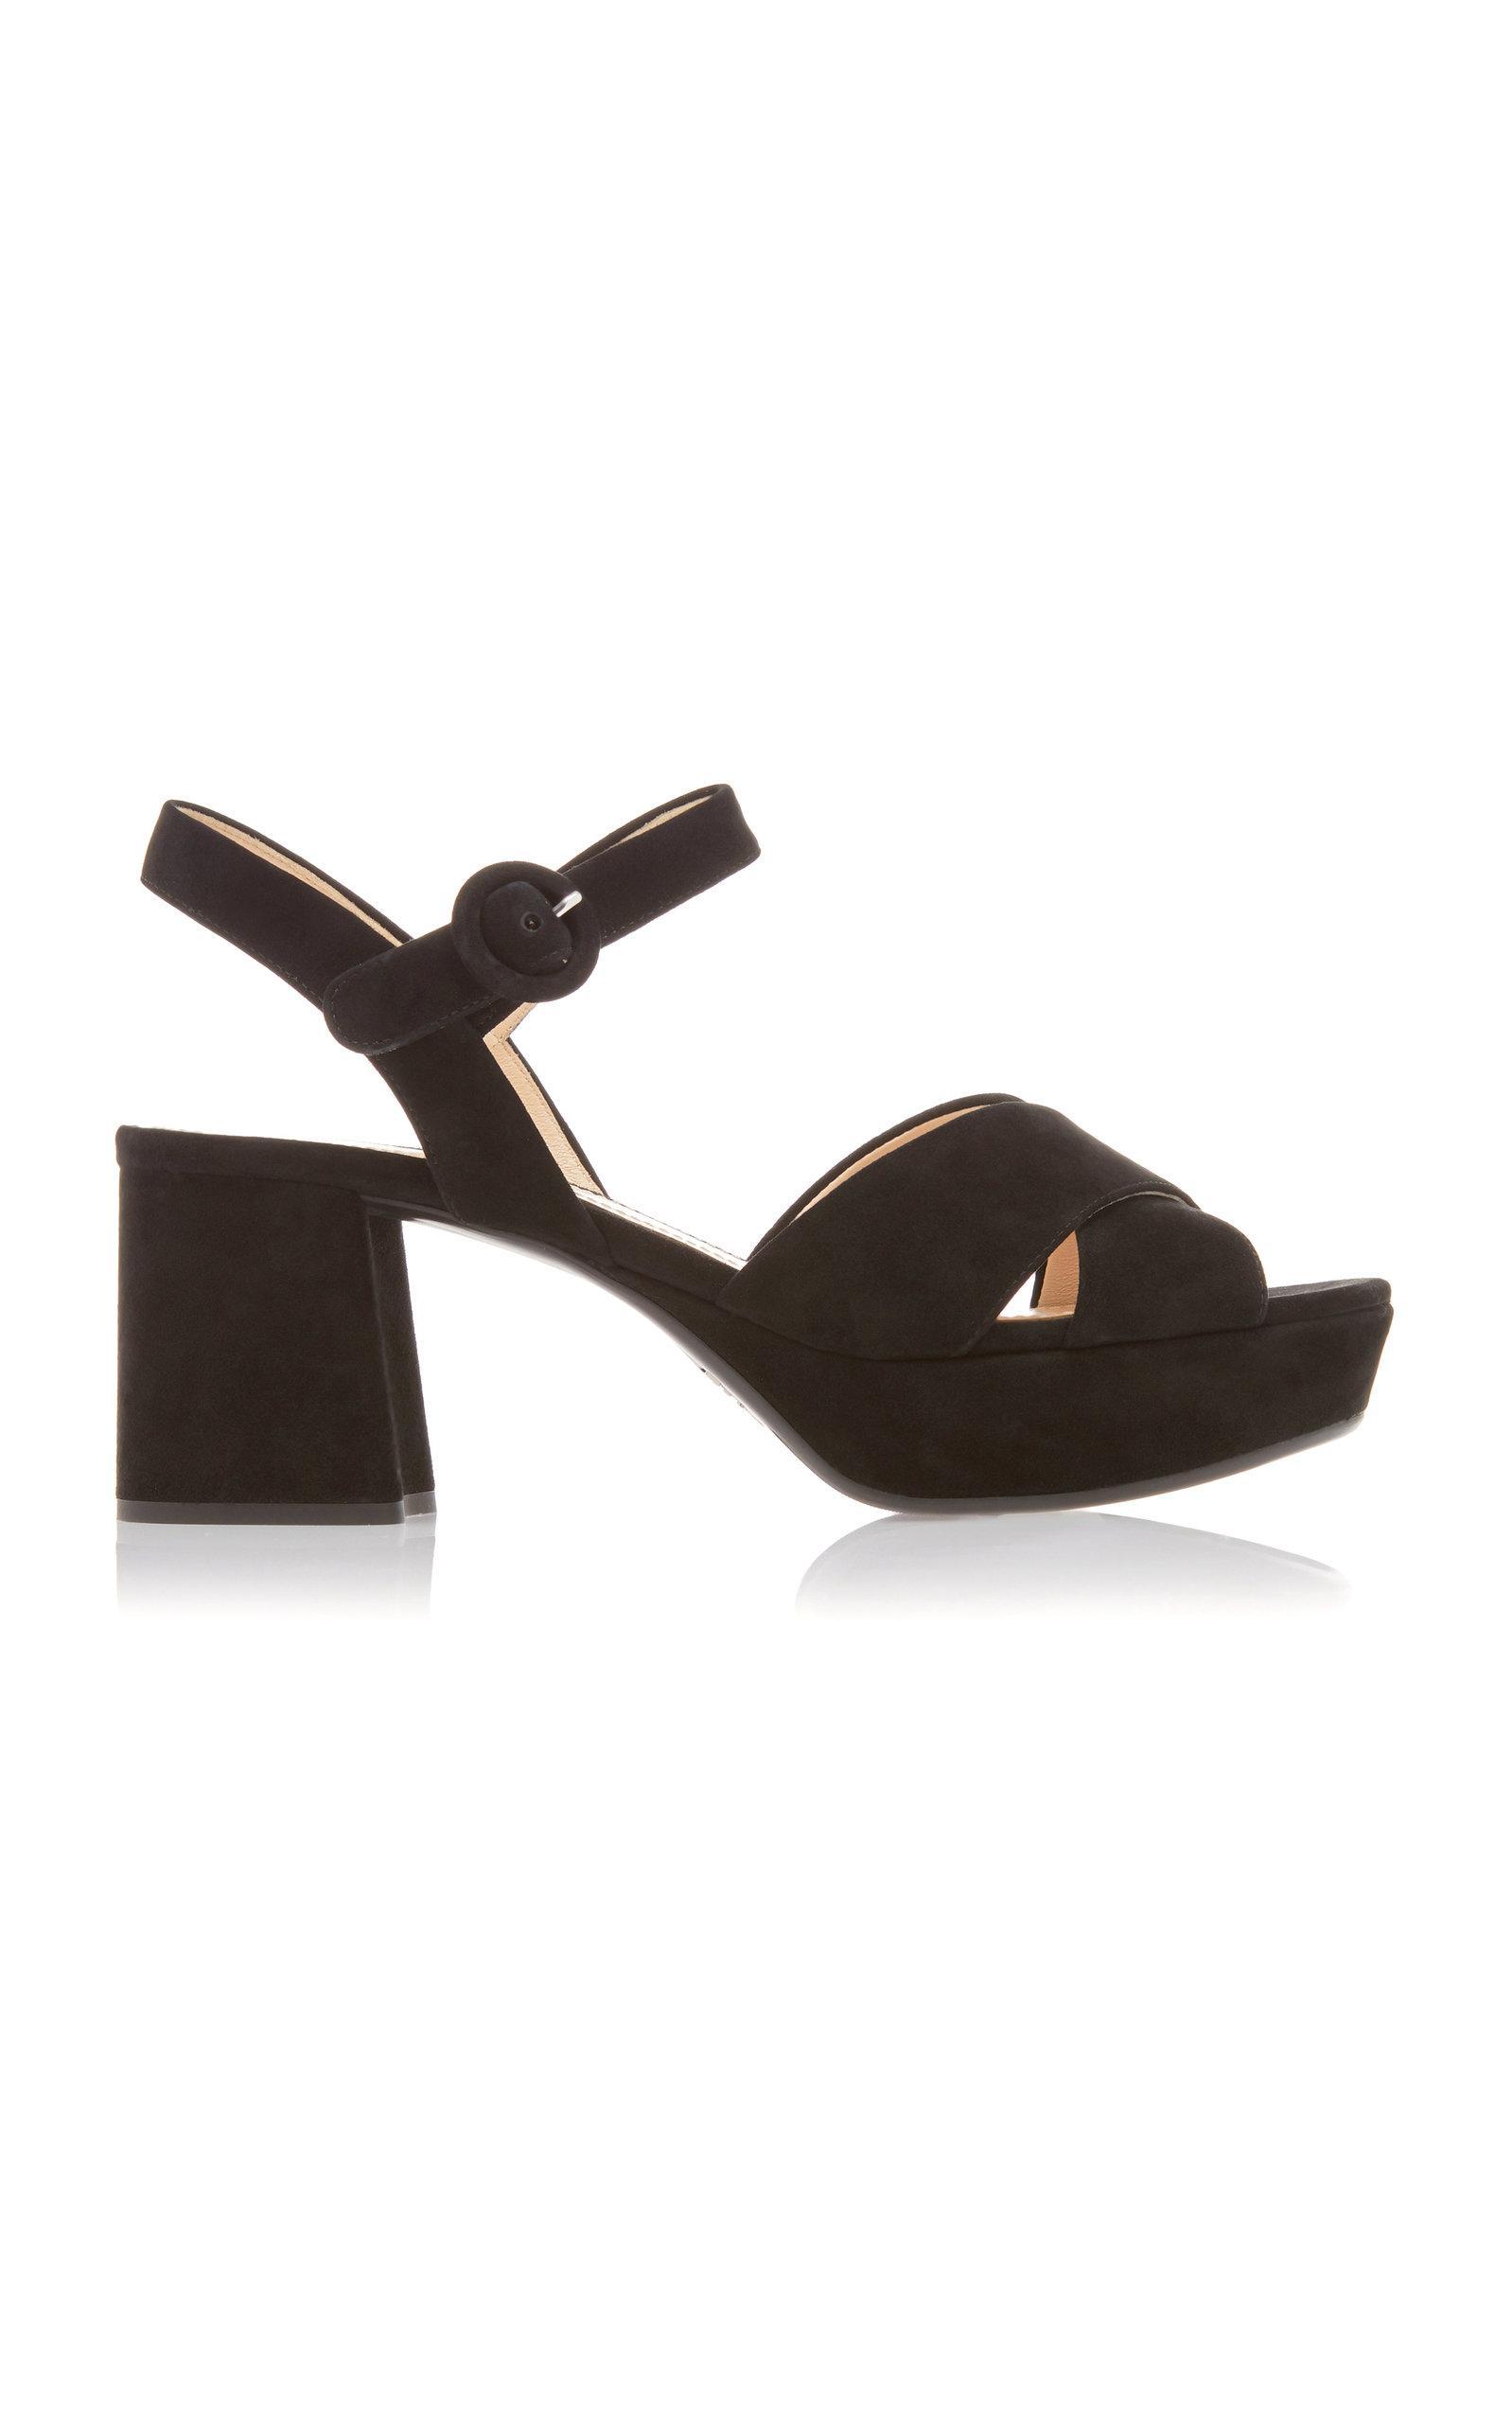 580ec066b18d Lyst - Prada Suede Platform Sandals in Black